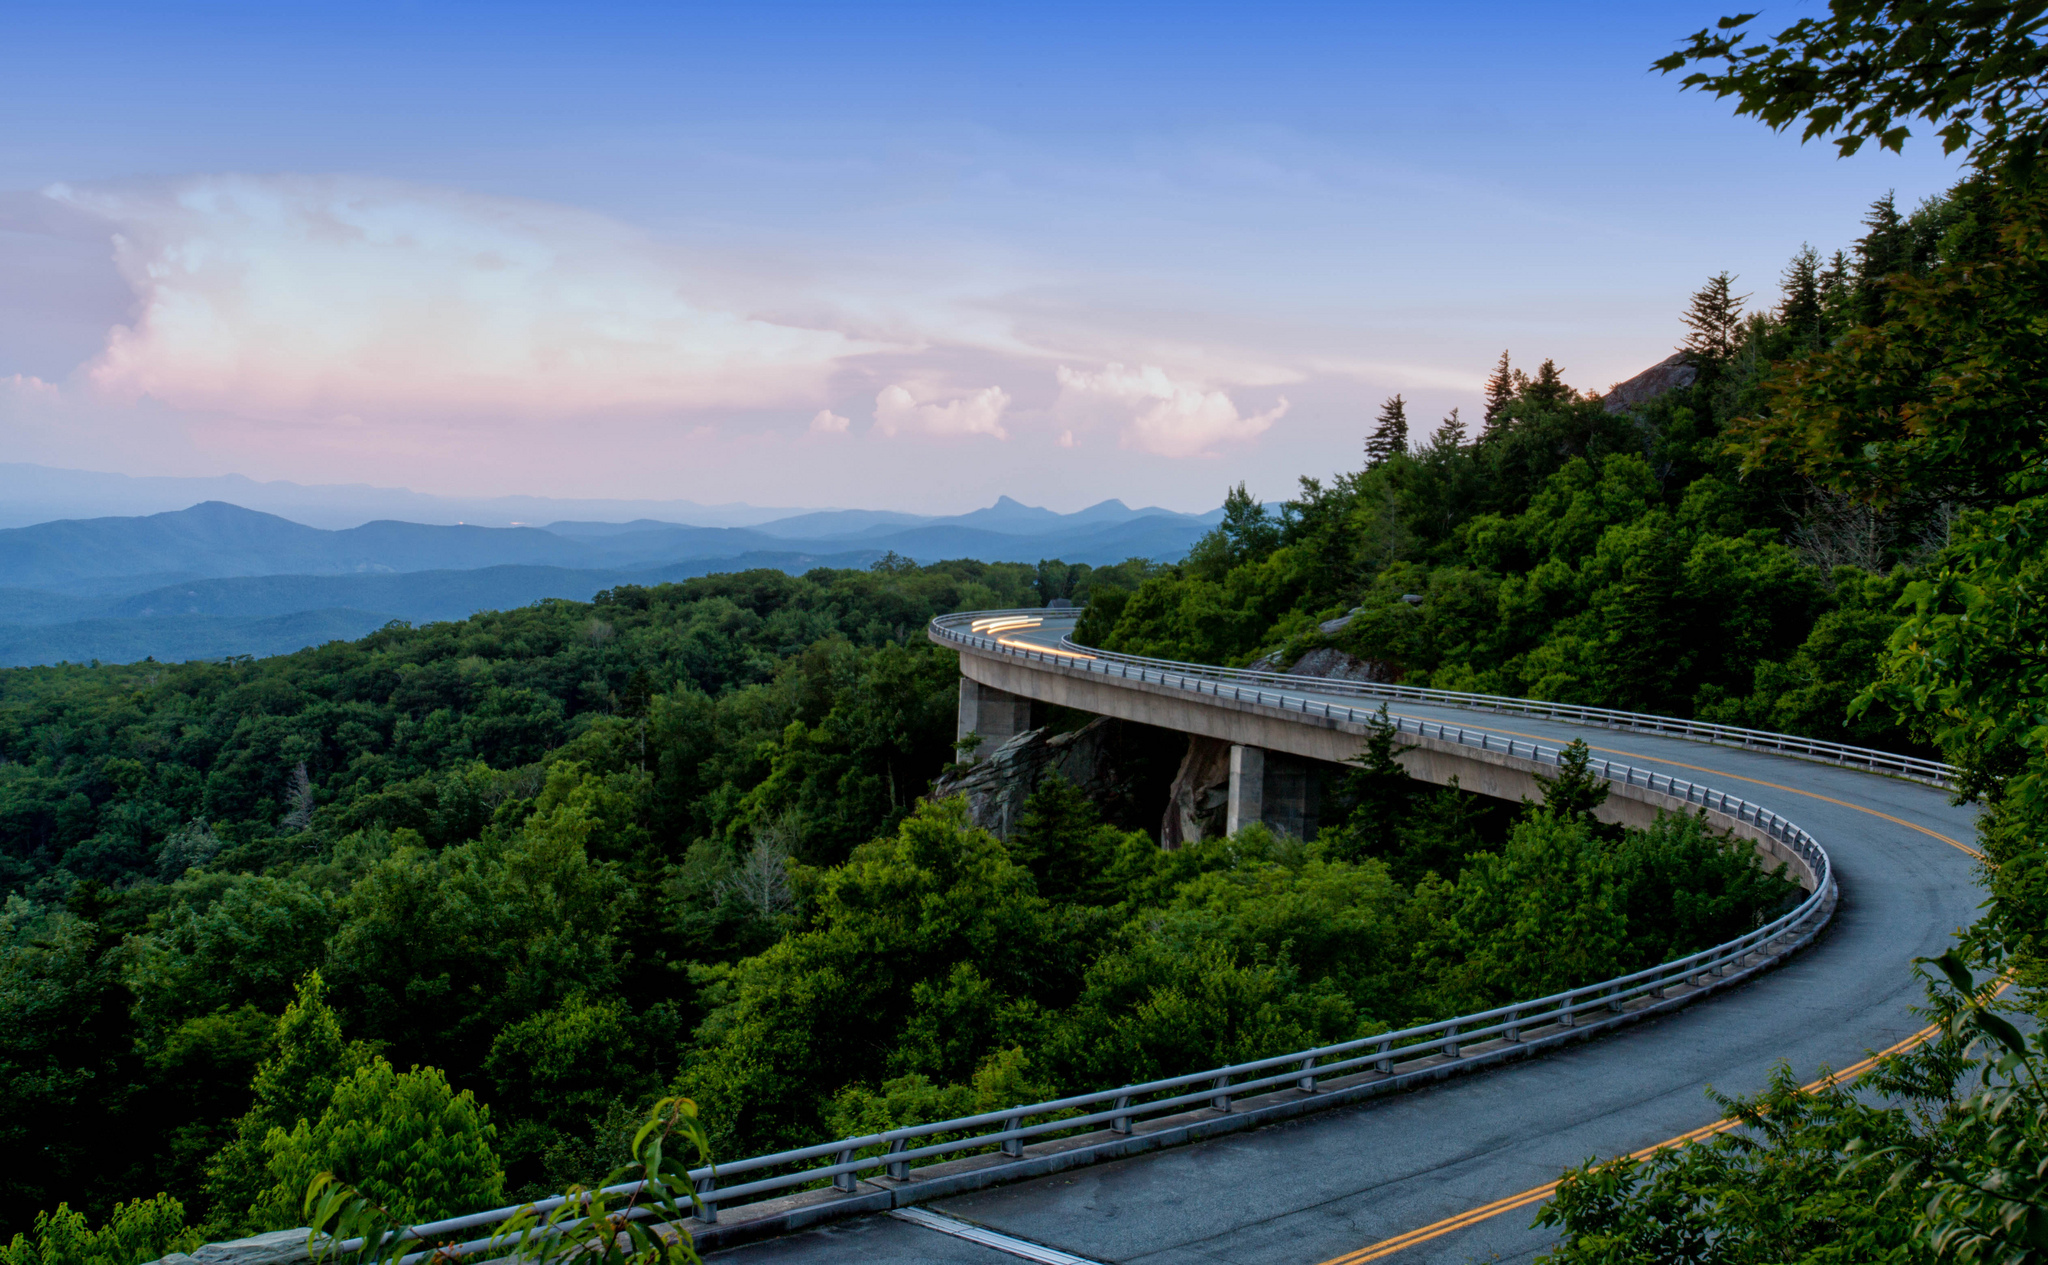 Appalachian Mountains Forest Mountain Road 2048x1265